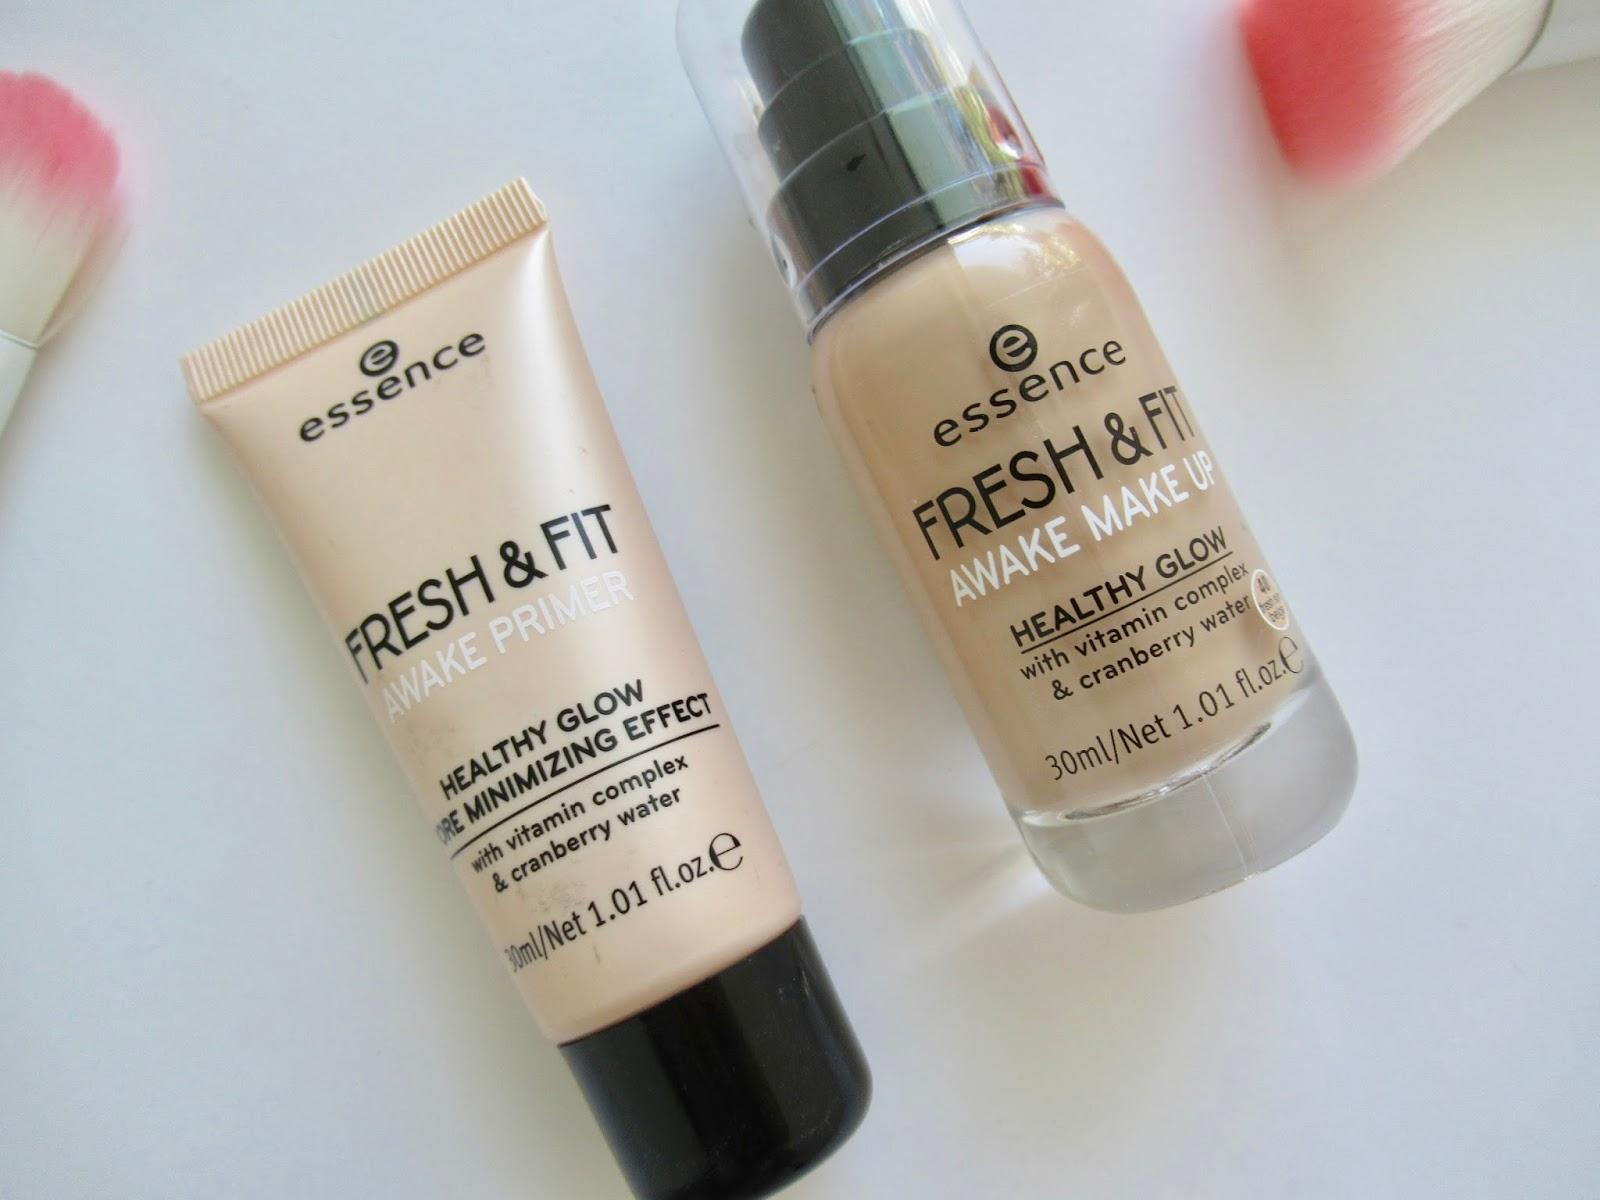 2a51c713e Reseña: Primer y Base de maquillaje Fresh & Fit de Essence - La ...